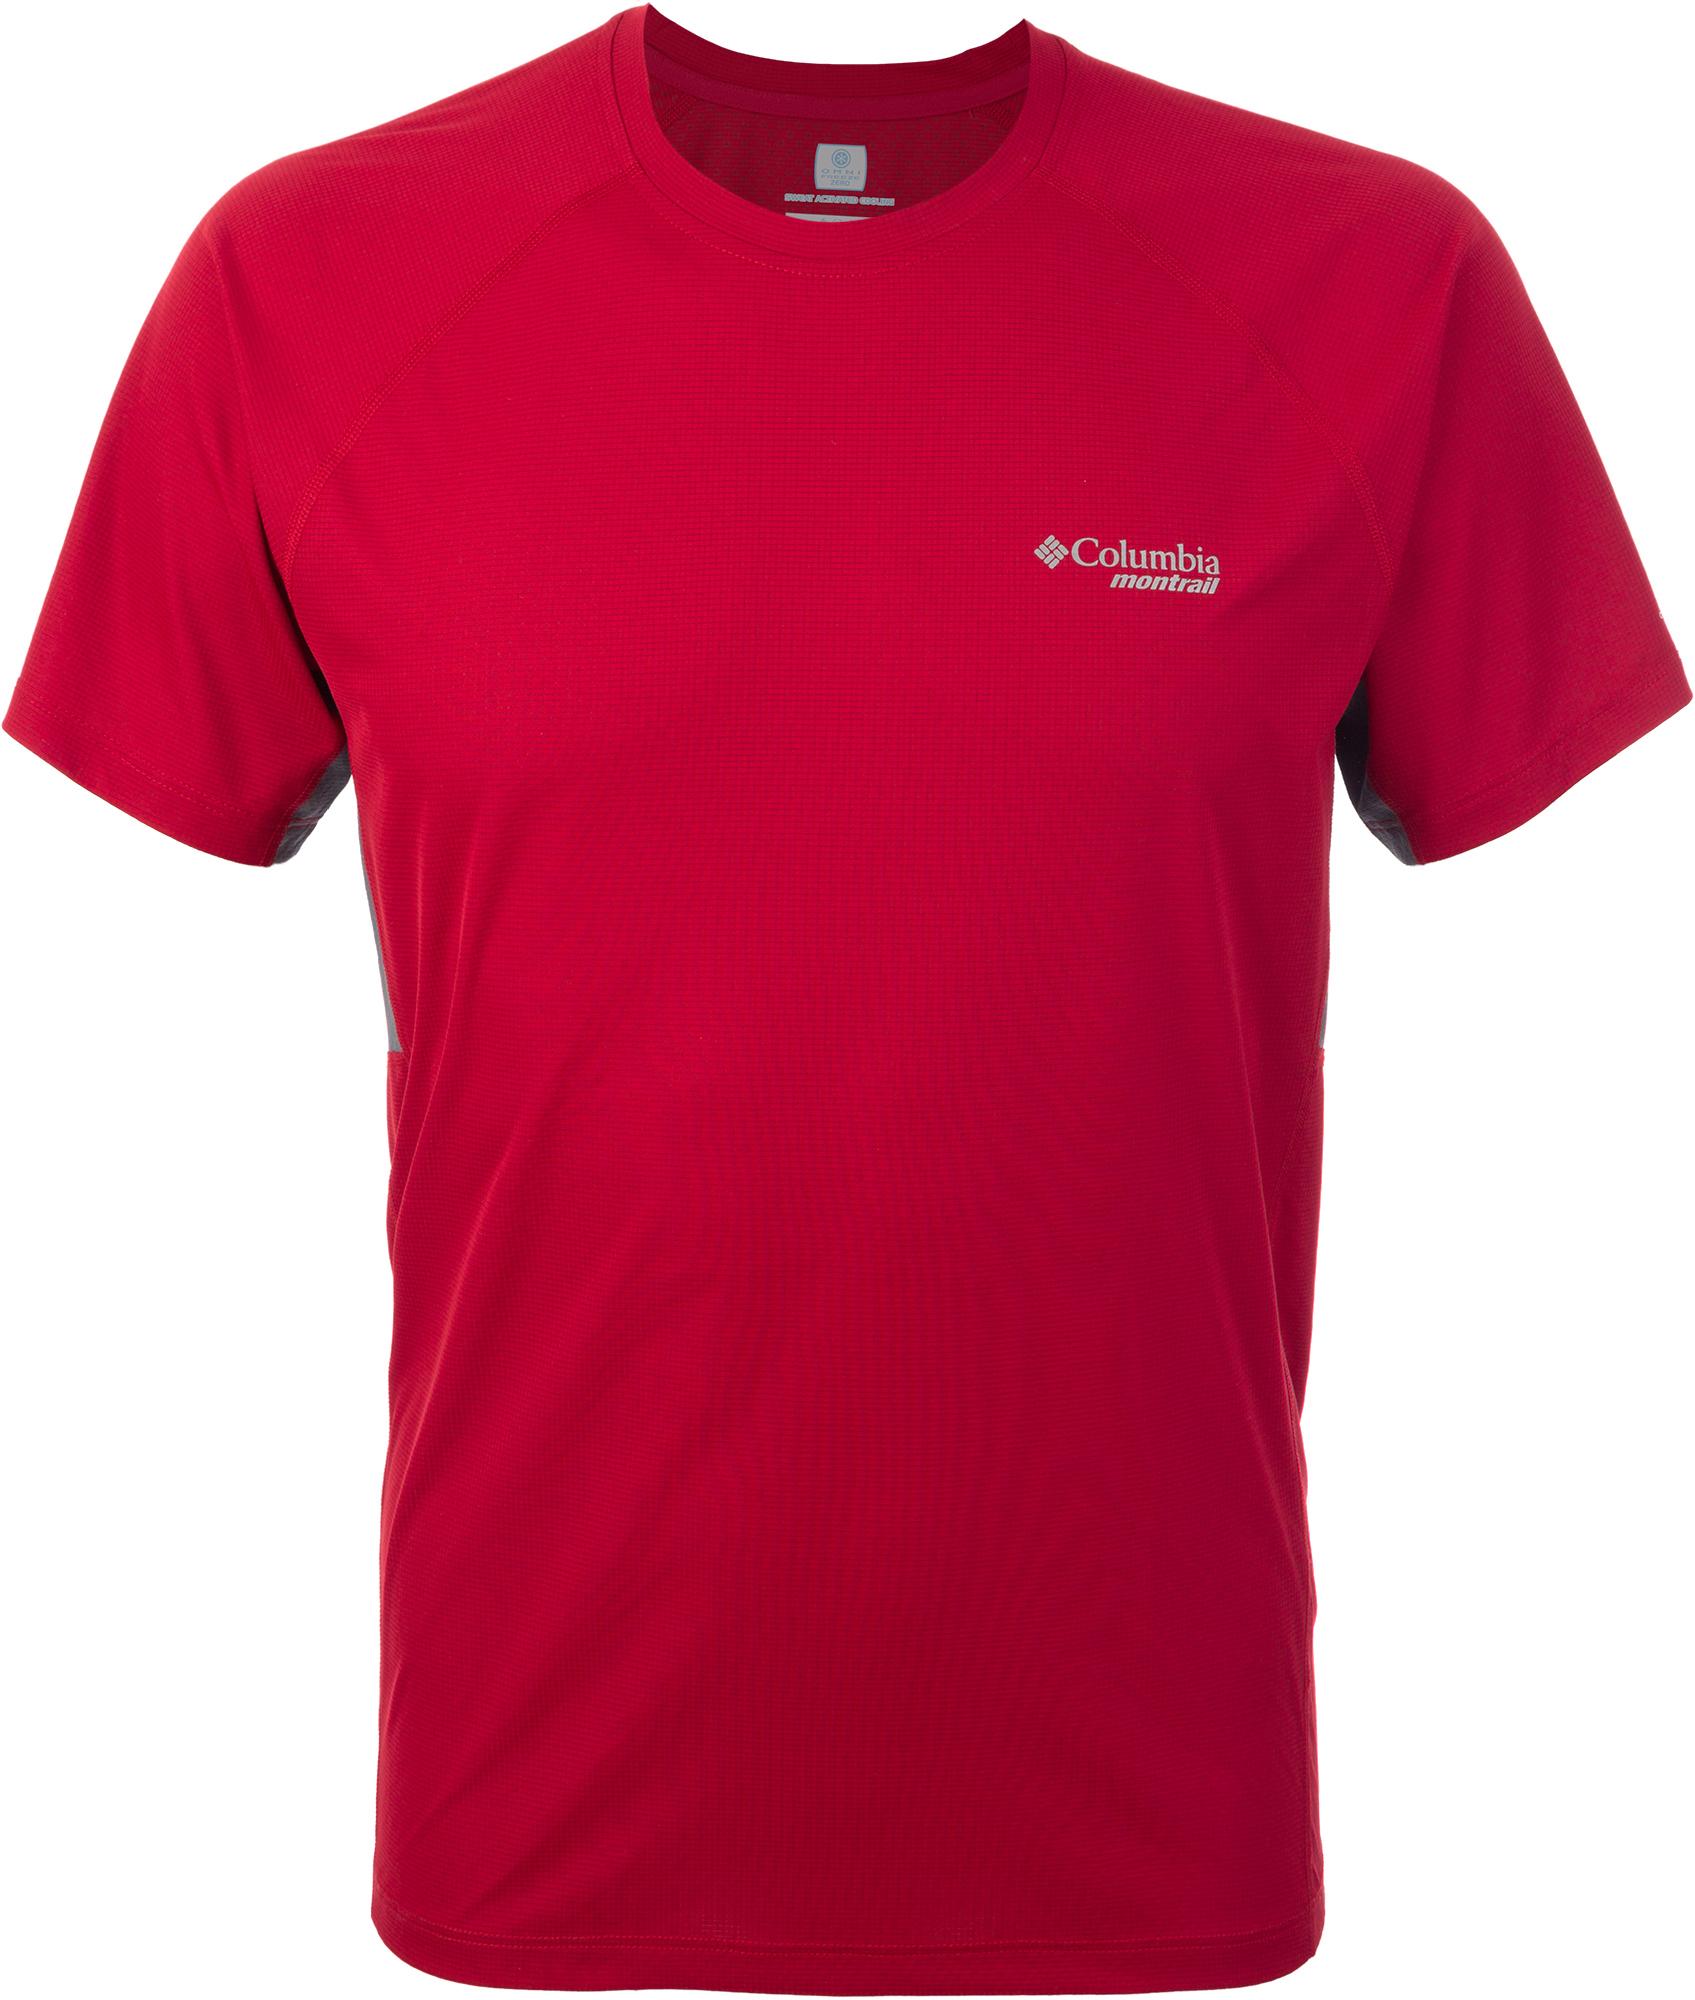 Columbia Футболка мужская Columbia Titan Ultra, размер 46-48 футболка женская oodji ultra цвет черный бирюзовый 14707001 17 46154 2973f размер m 46